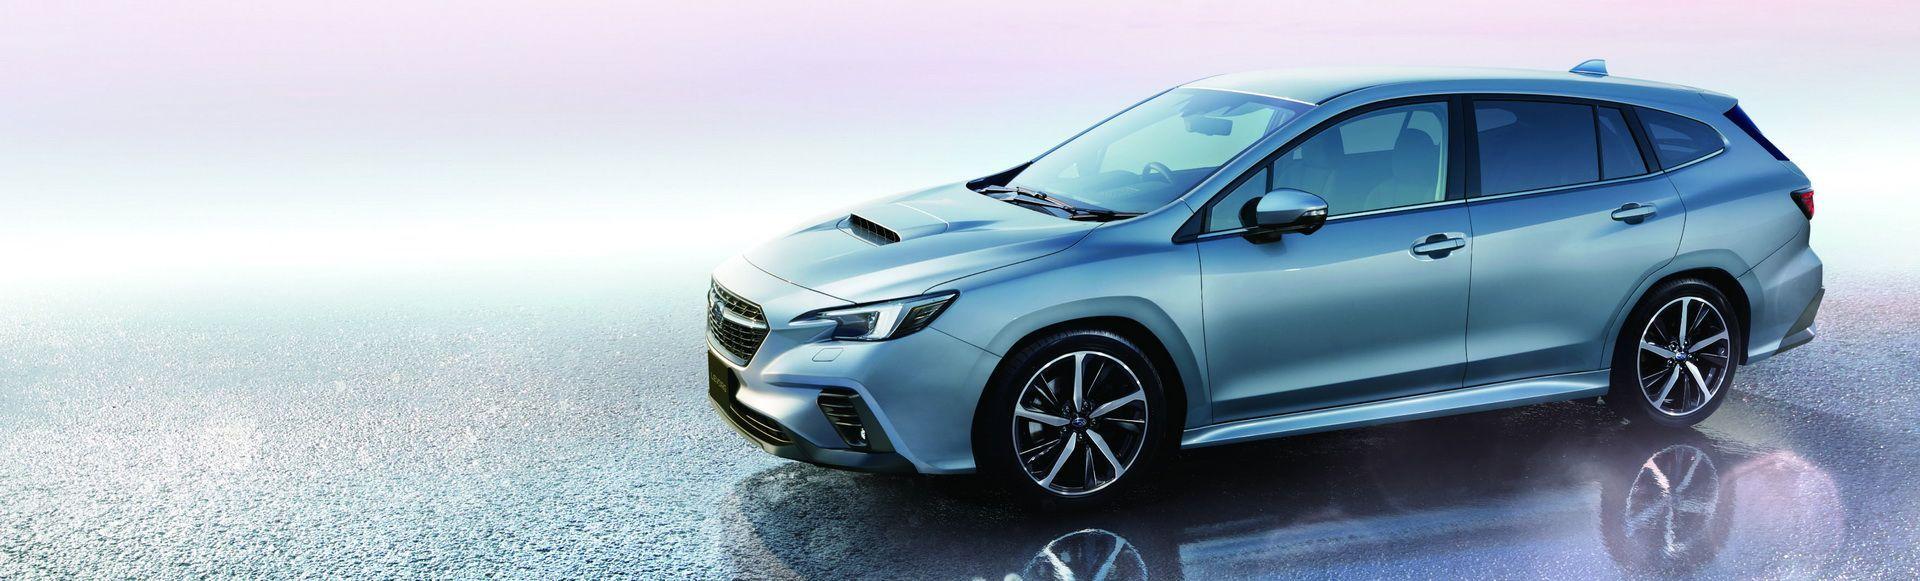 2021_Subaru_Levorg_0075